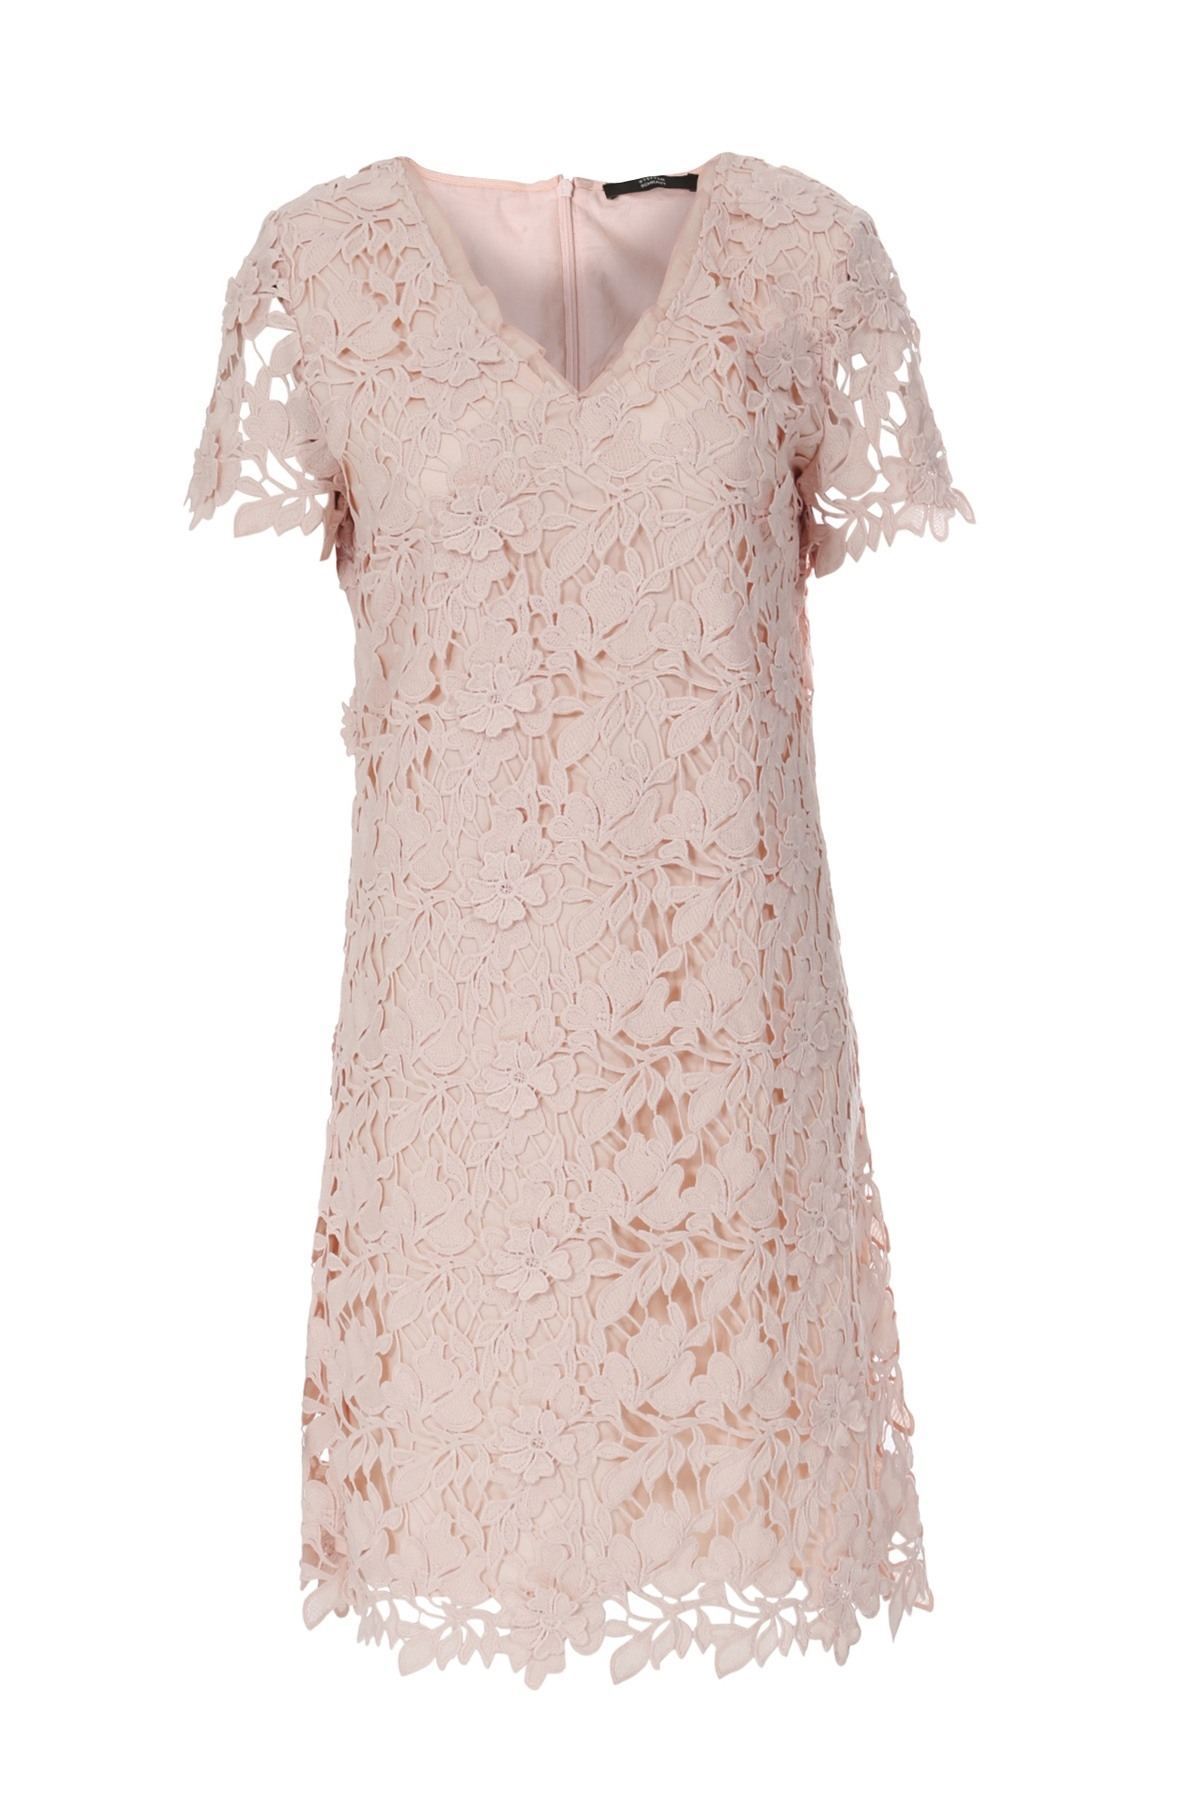 17 Genial Kleid Spitze Galerie10 Top Kleid Spitze Vertrieb